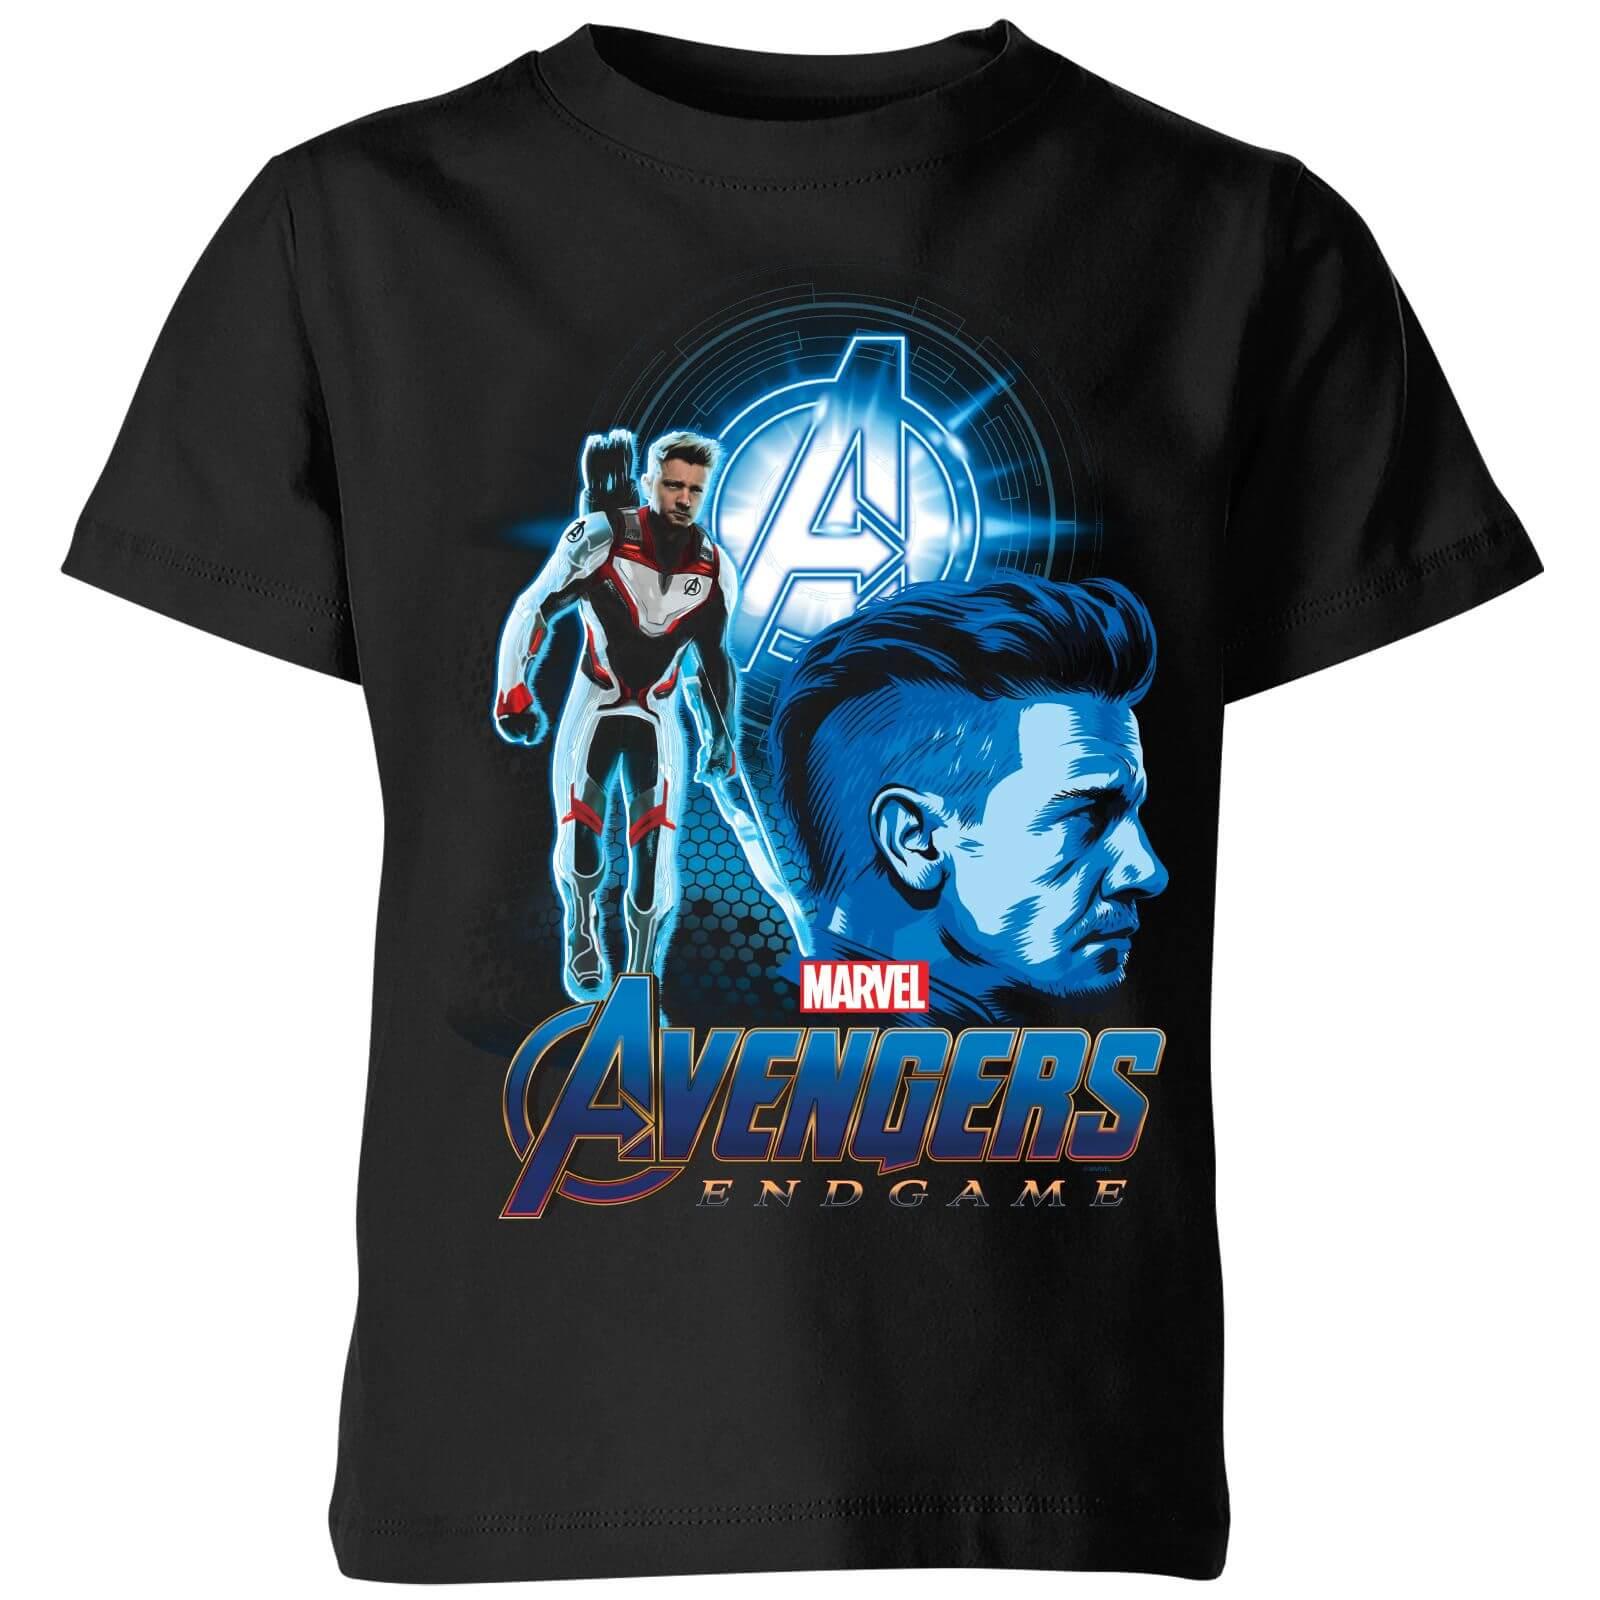 fc433e72b35d7 Avengers  Endgame Hawkeye Suit Kids  T-Shirt - Black